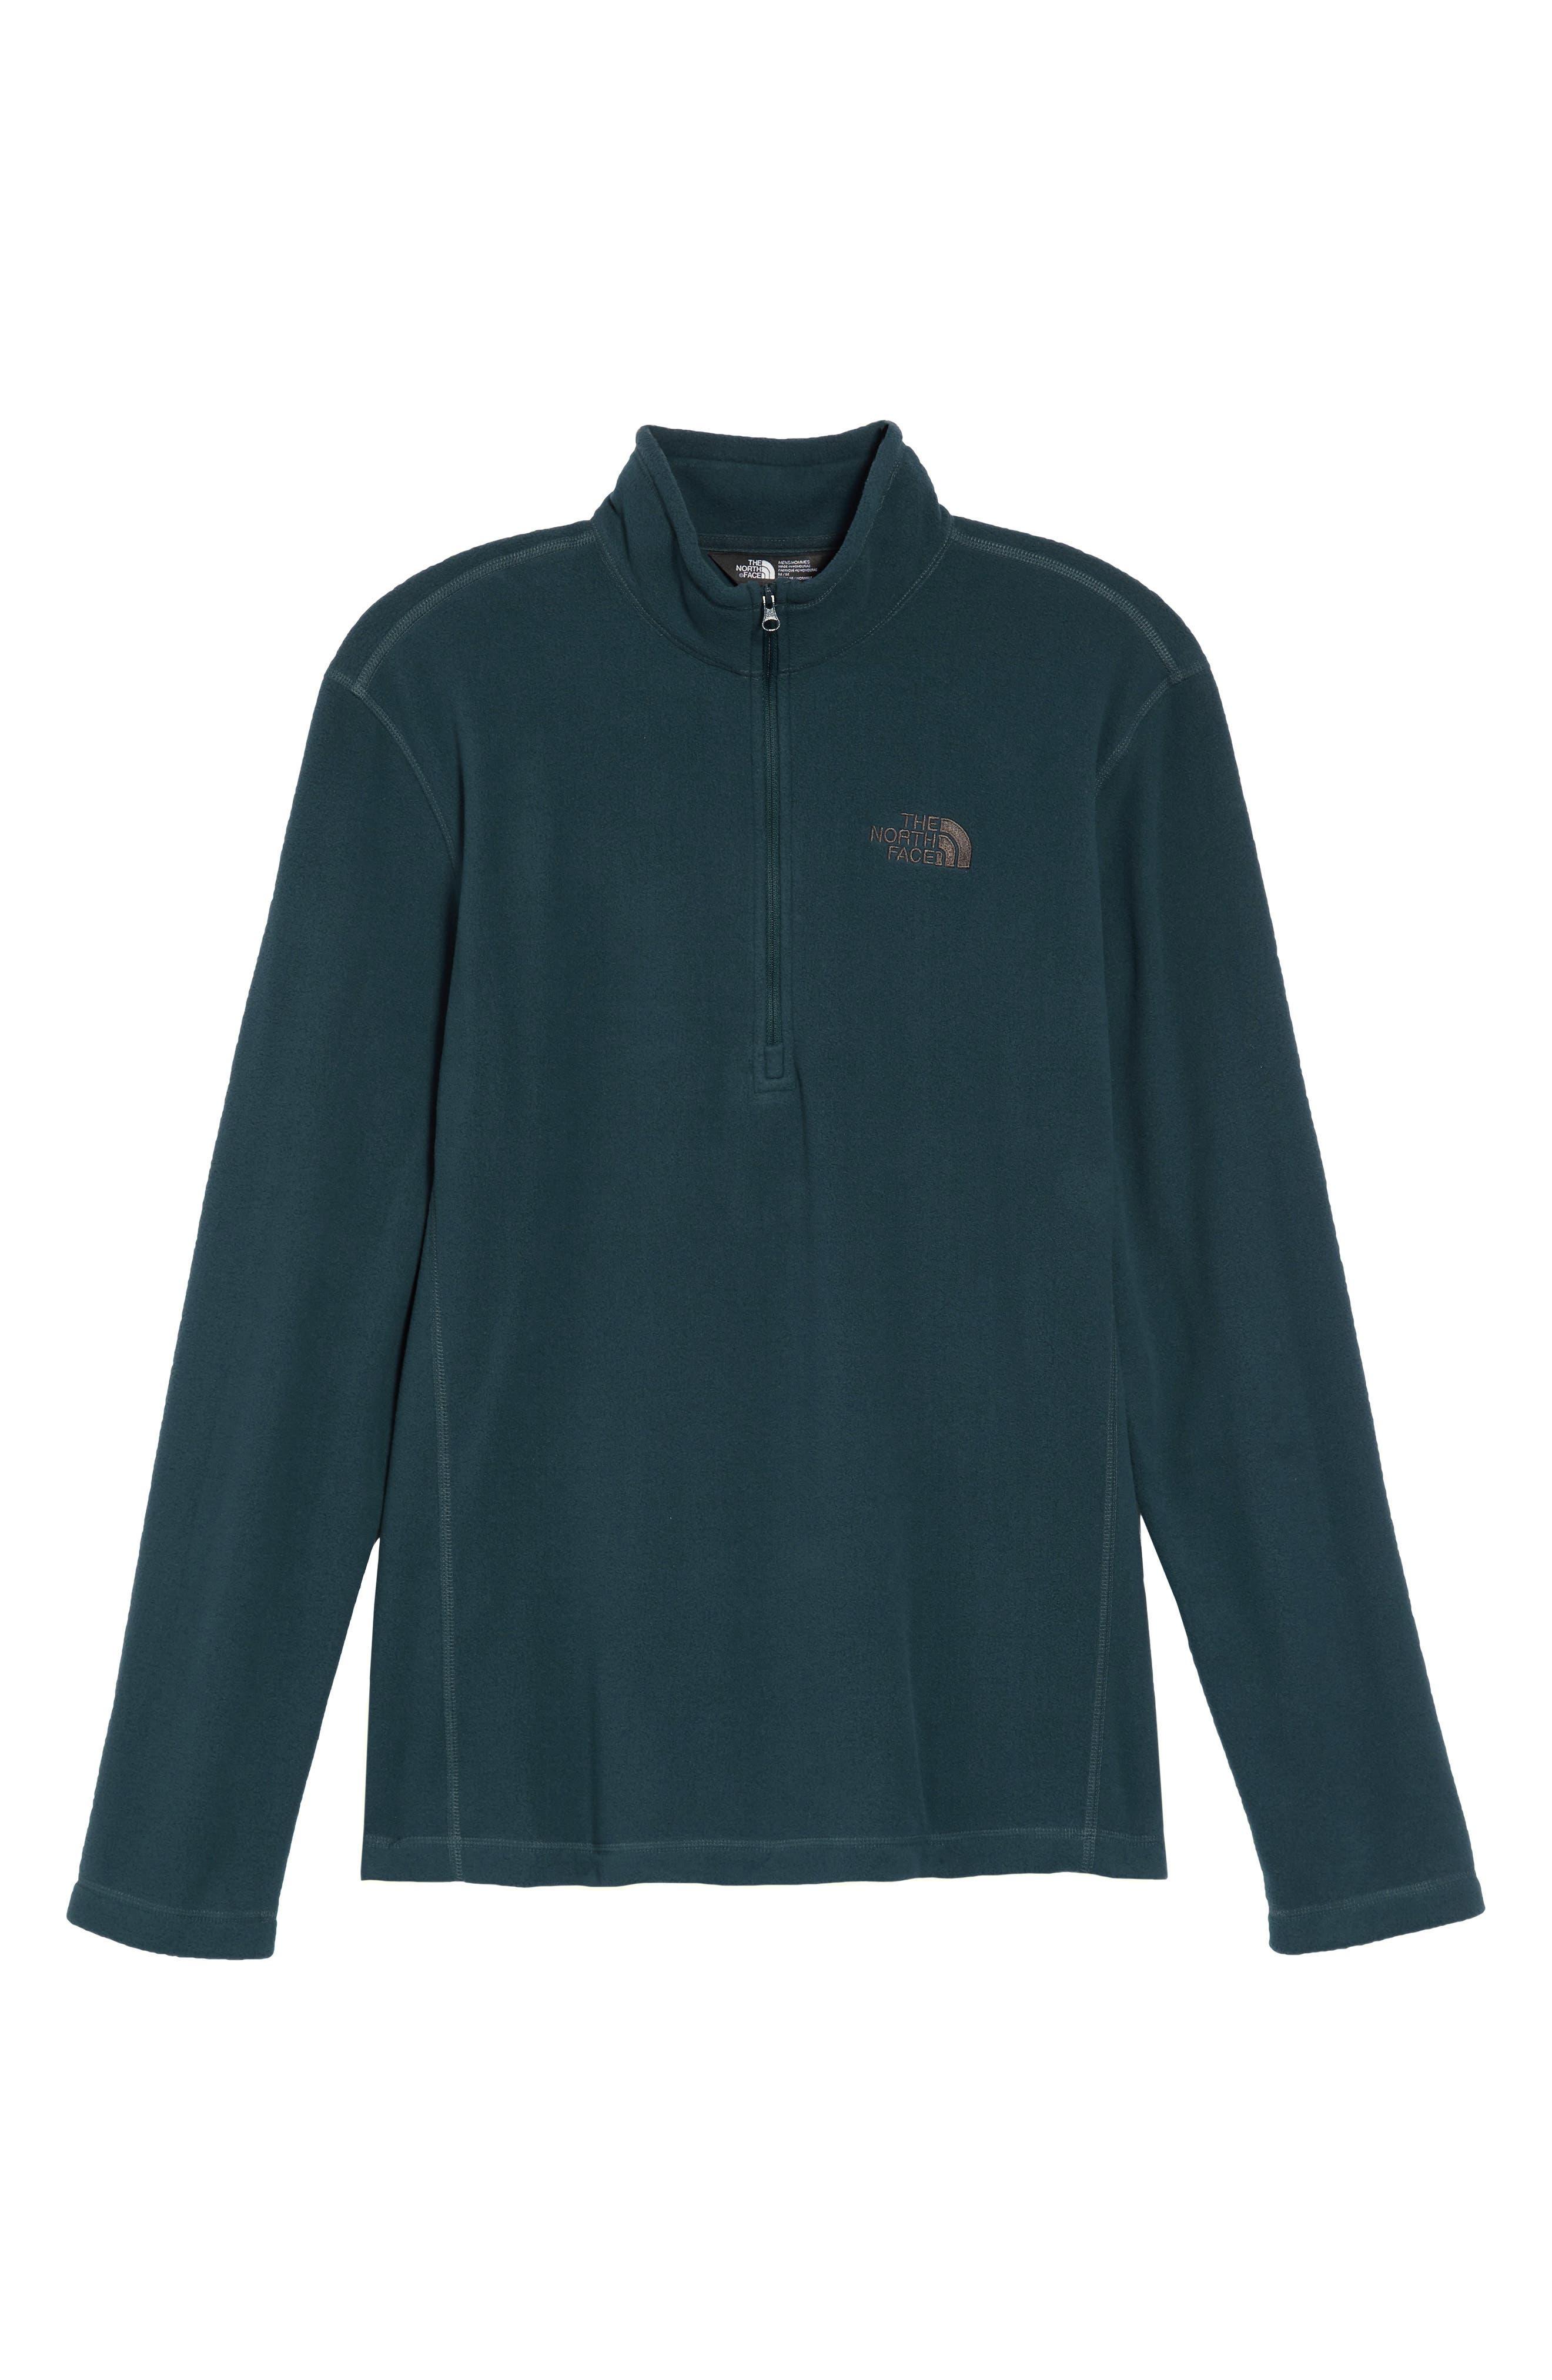 'TKA 100 Glacier' Quarter Zip Fleece Pullover,                             Alternate thumbnail 195, color,